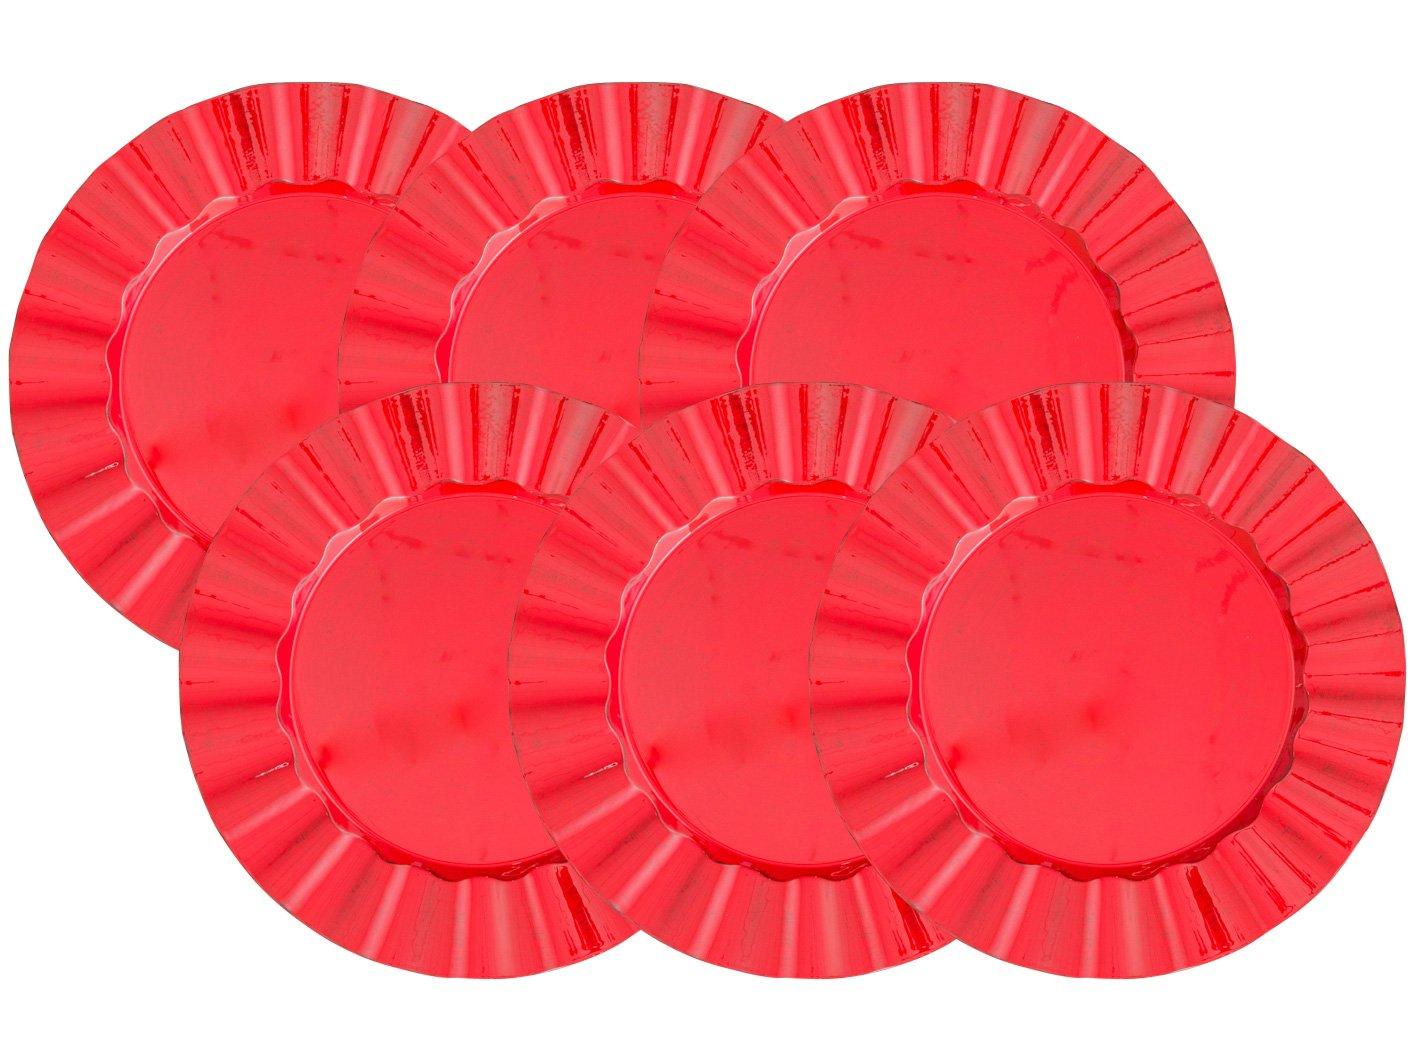 Foto 1 - Sousplat Plástico Redondo Bon Gourmet Cook 30295 - 30295 6 Peças